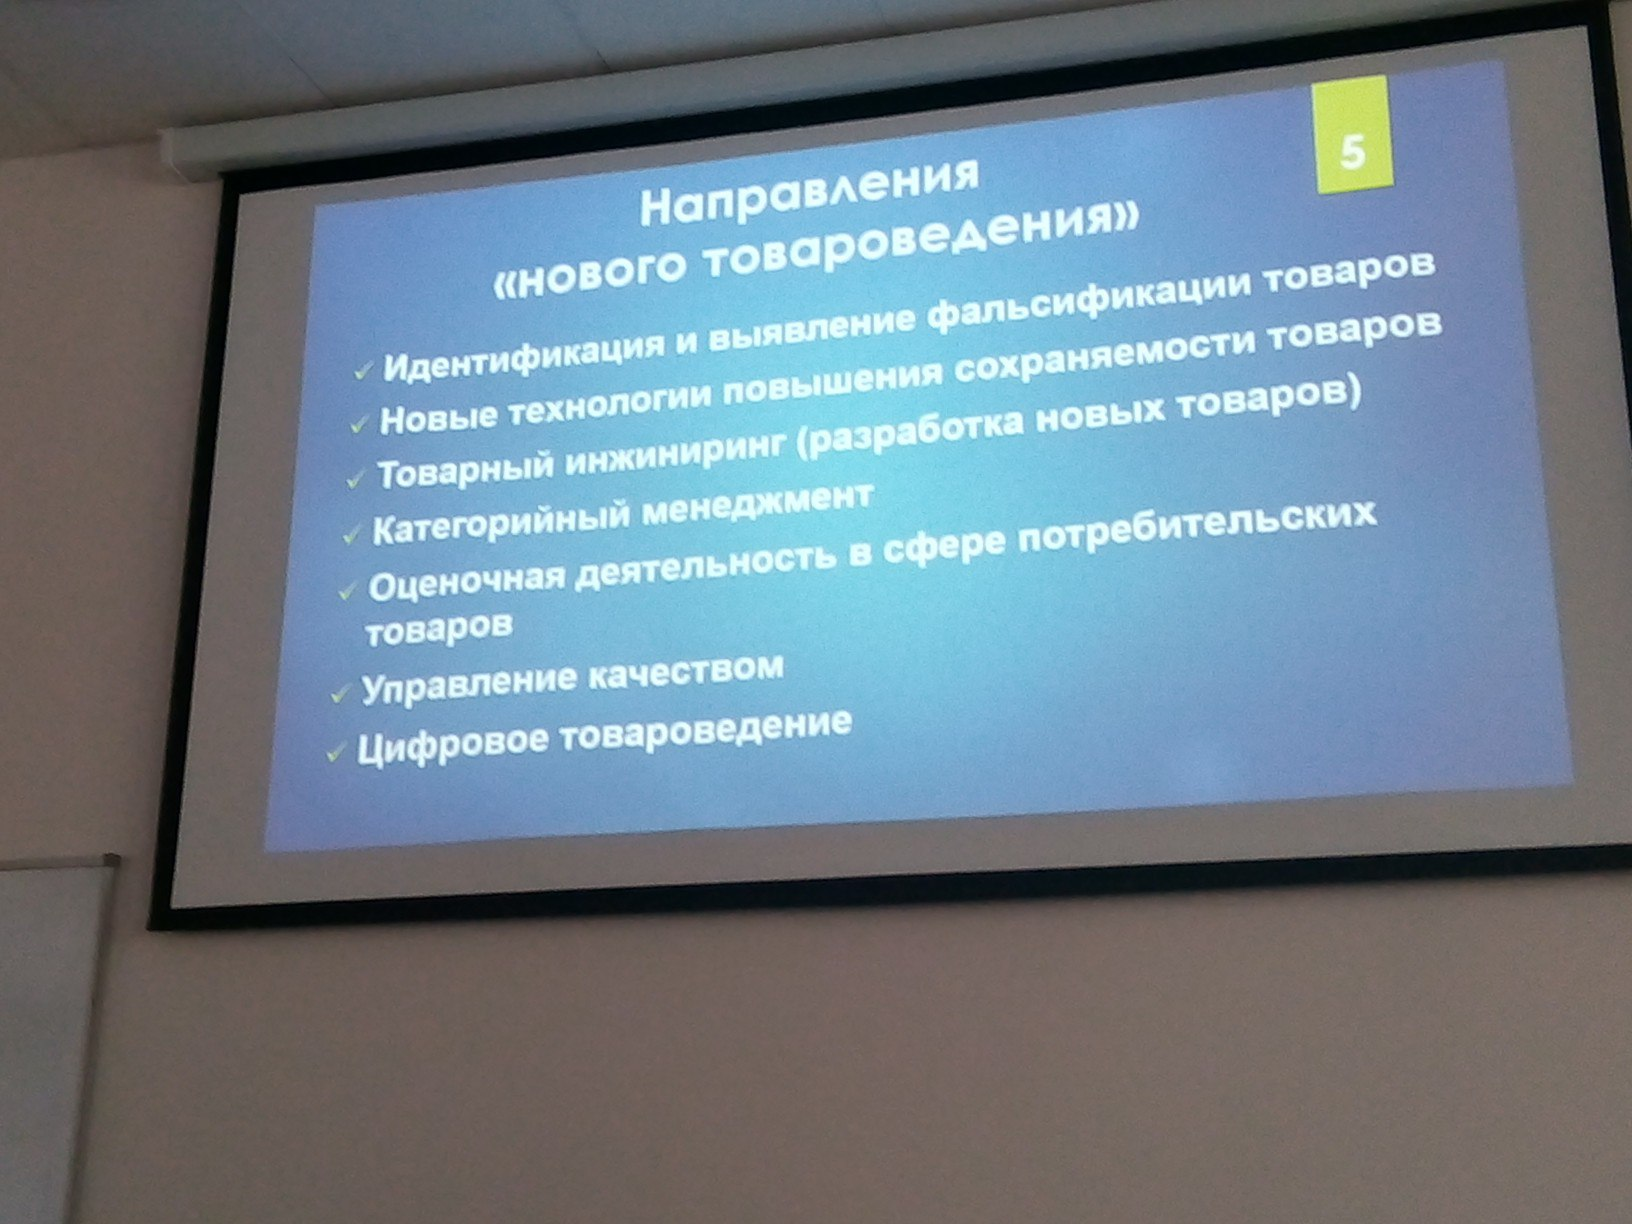 «ЦЕВЕРИТИНОВСКИХ ЧТЕНИЯХ - 2018» - ДРТИ